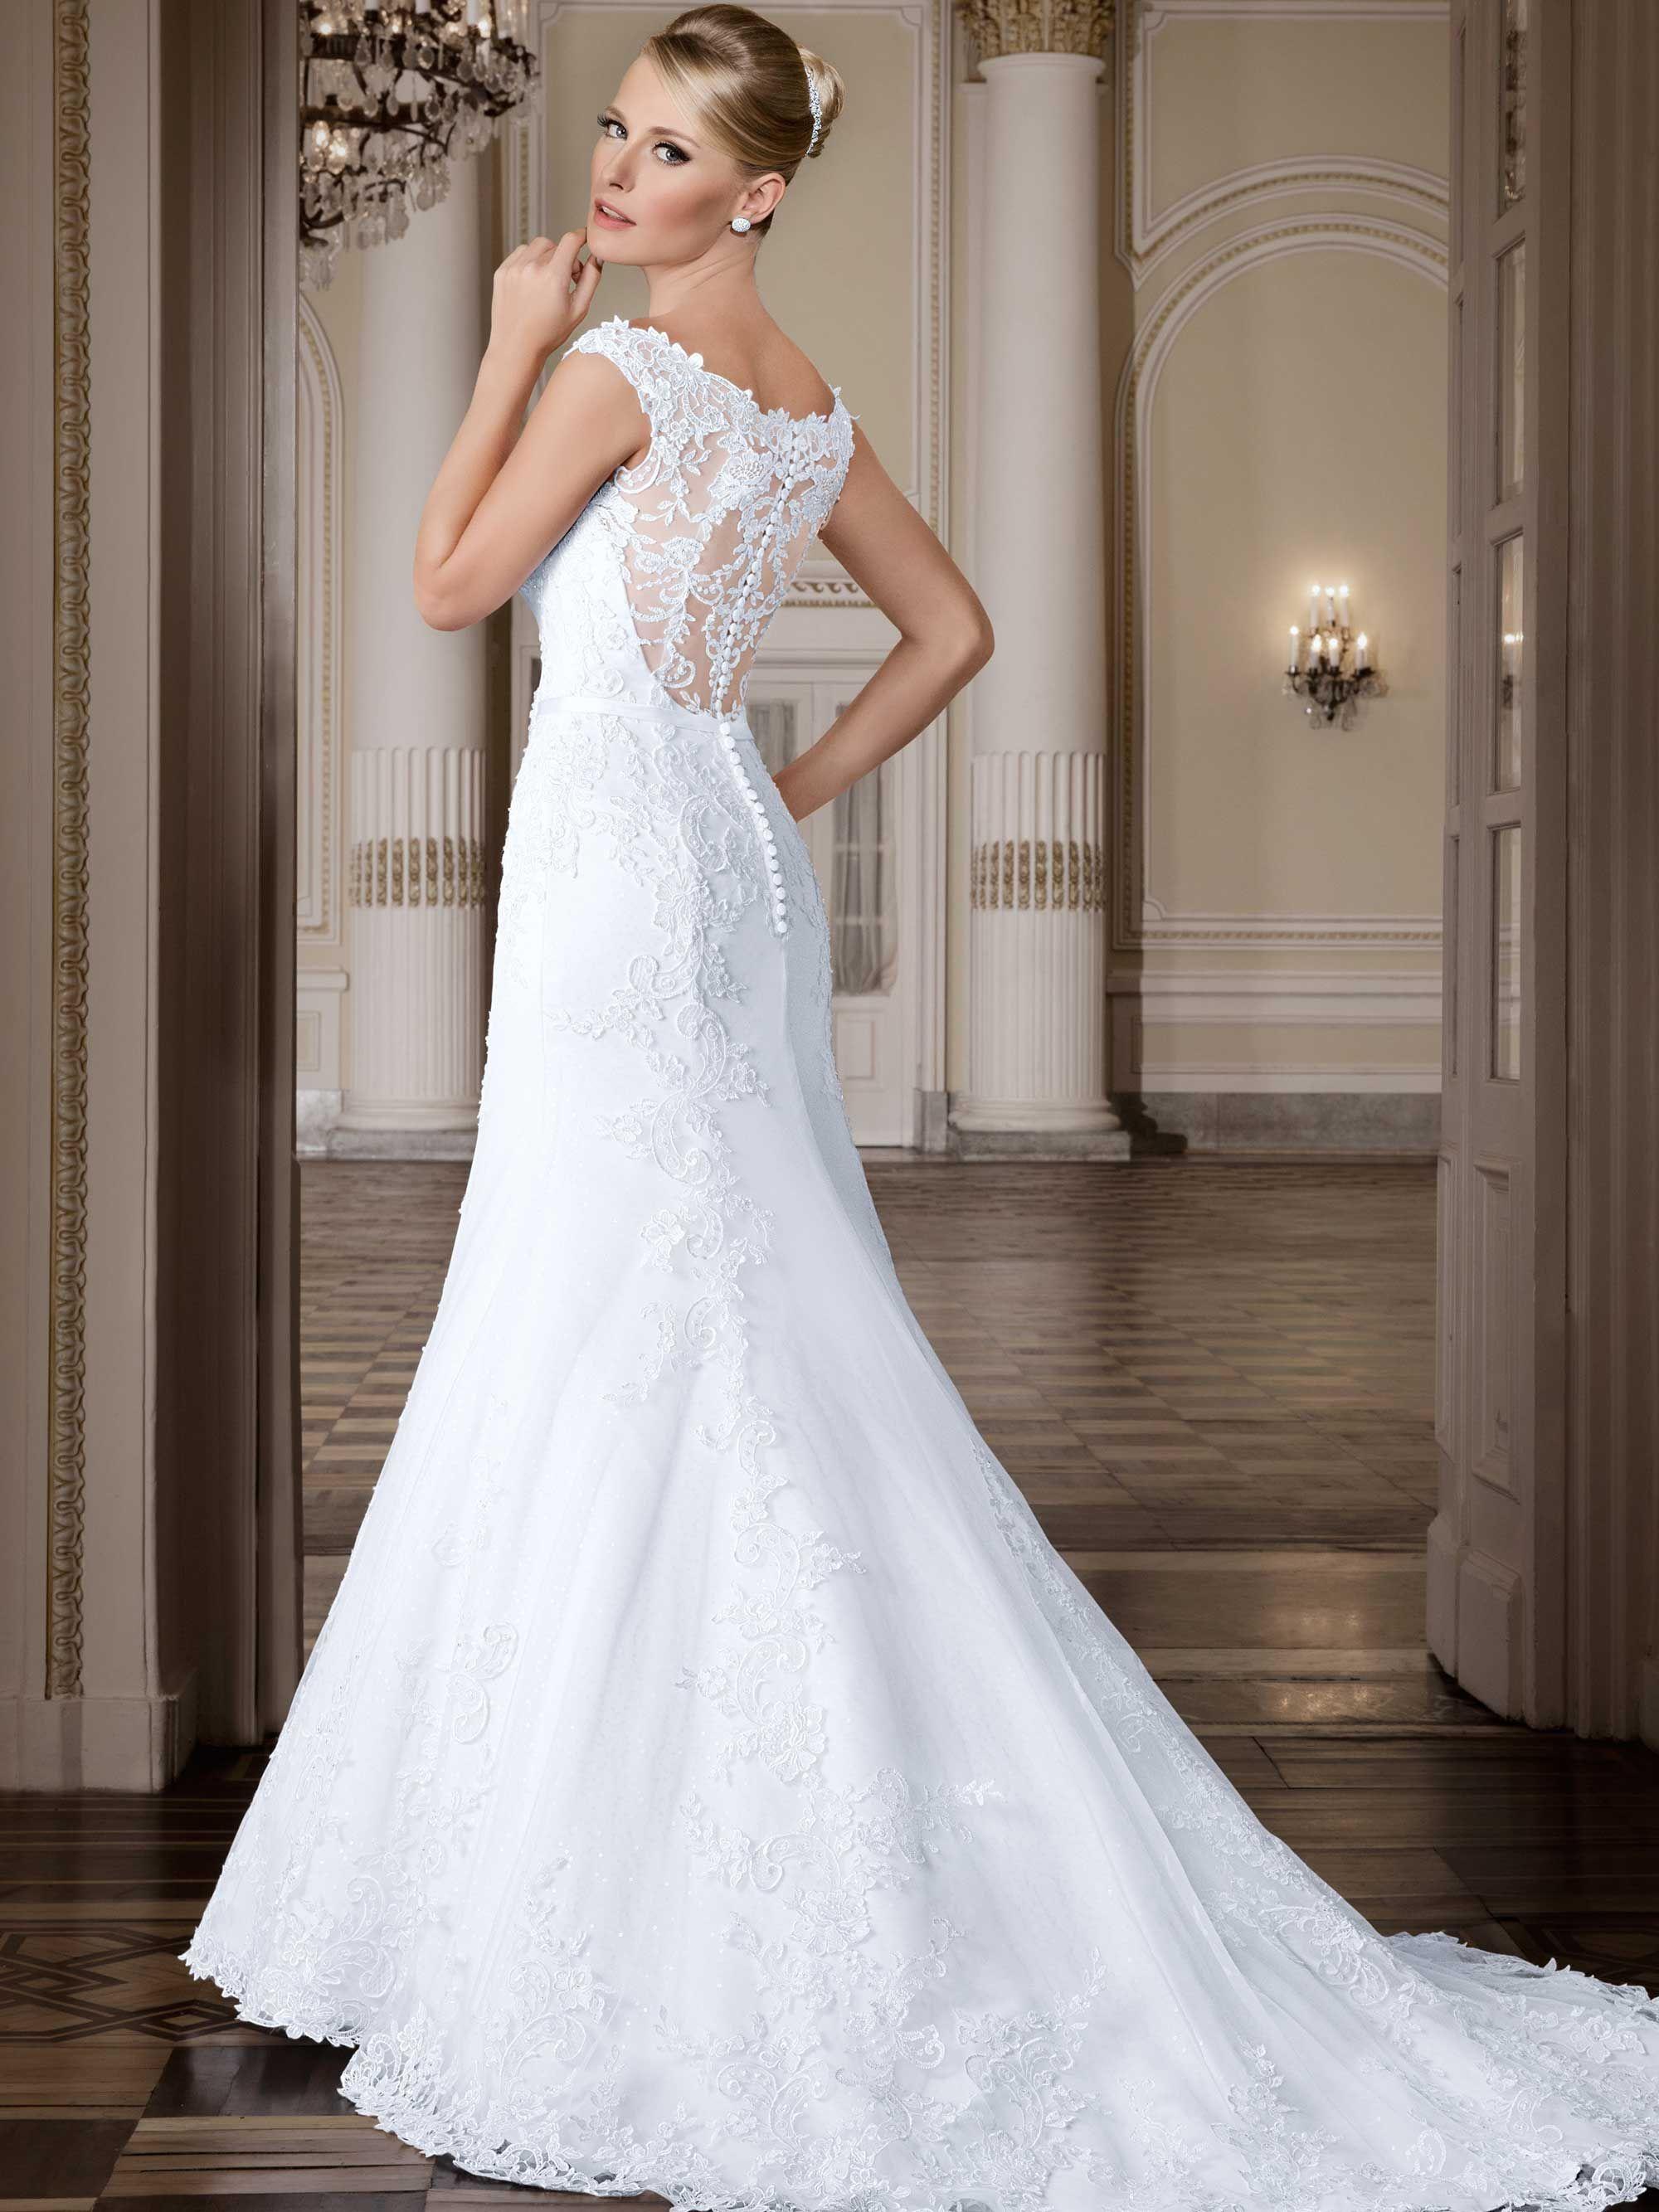 44b26803a Cinto Prata Perfeito Wedding t Prata Vestidos de noiva